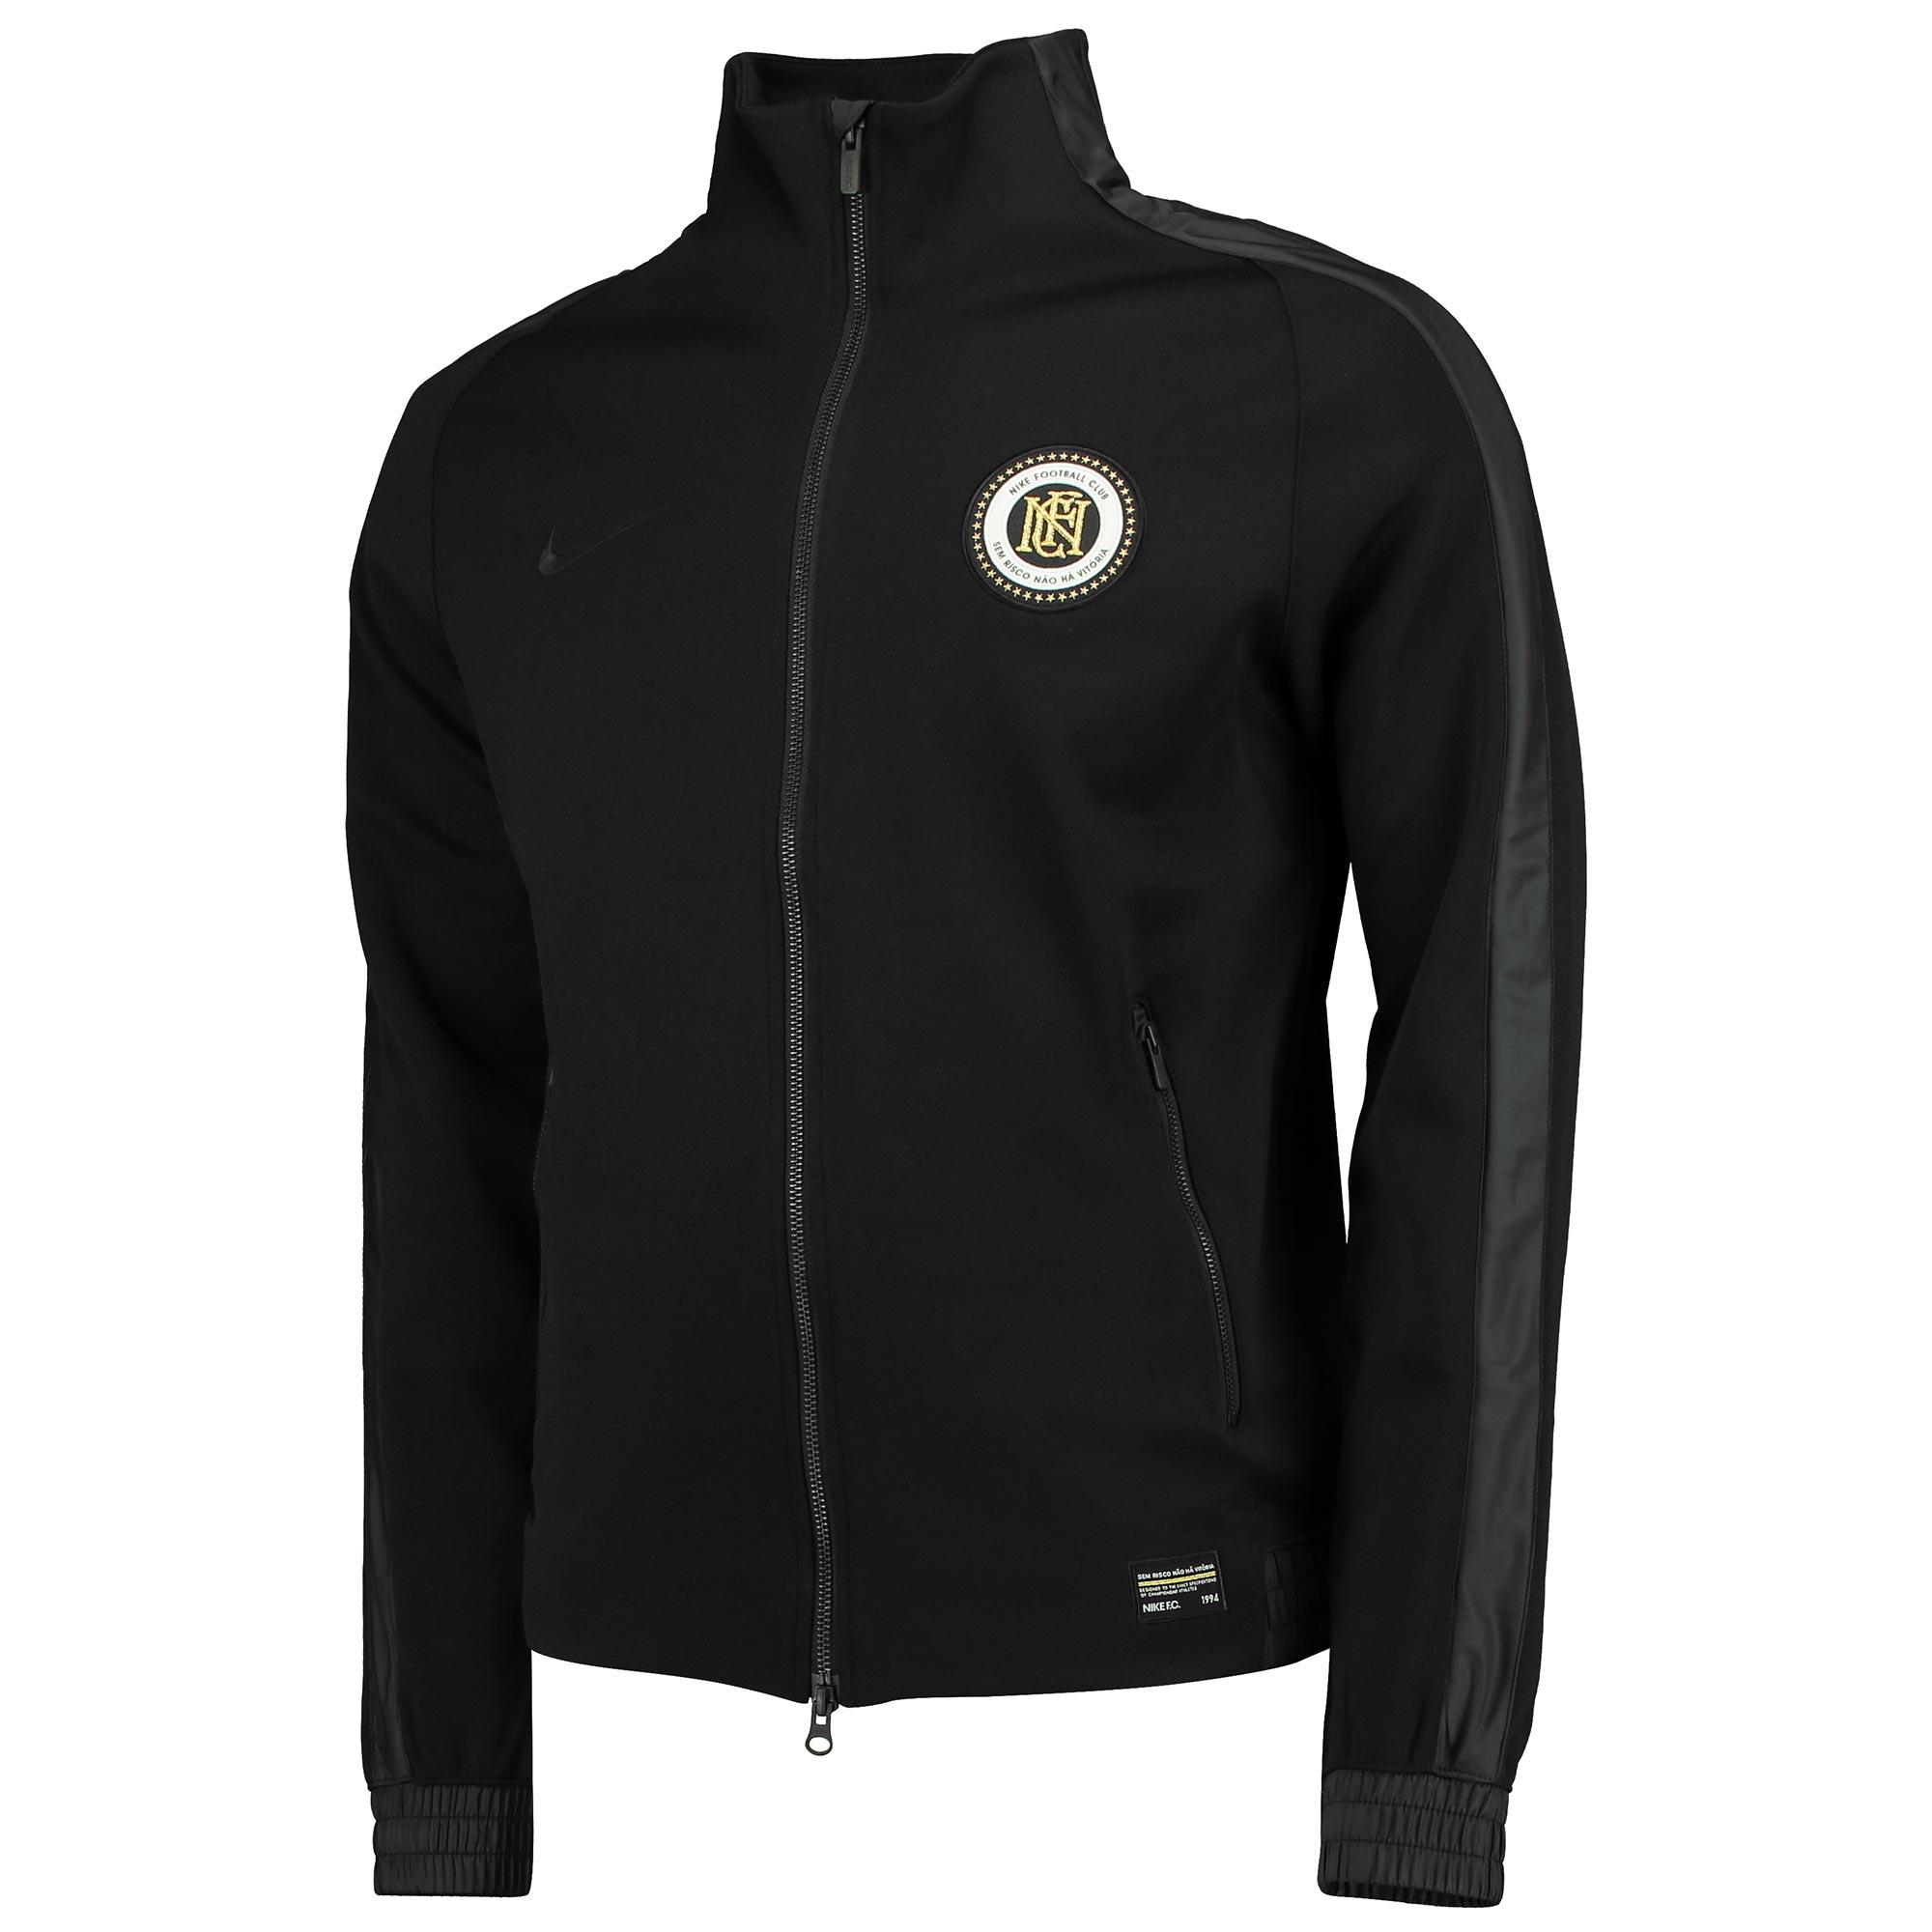 Nike F.C. Track Jacket - Black